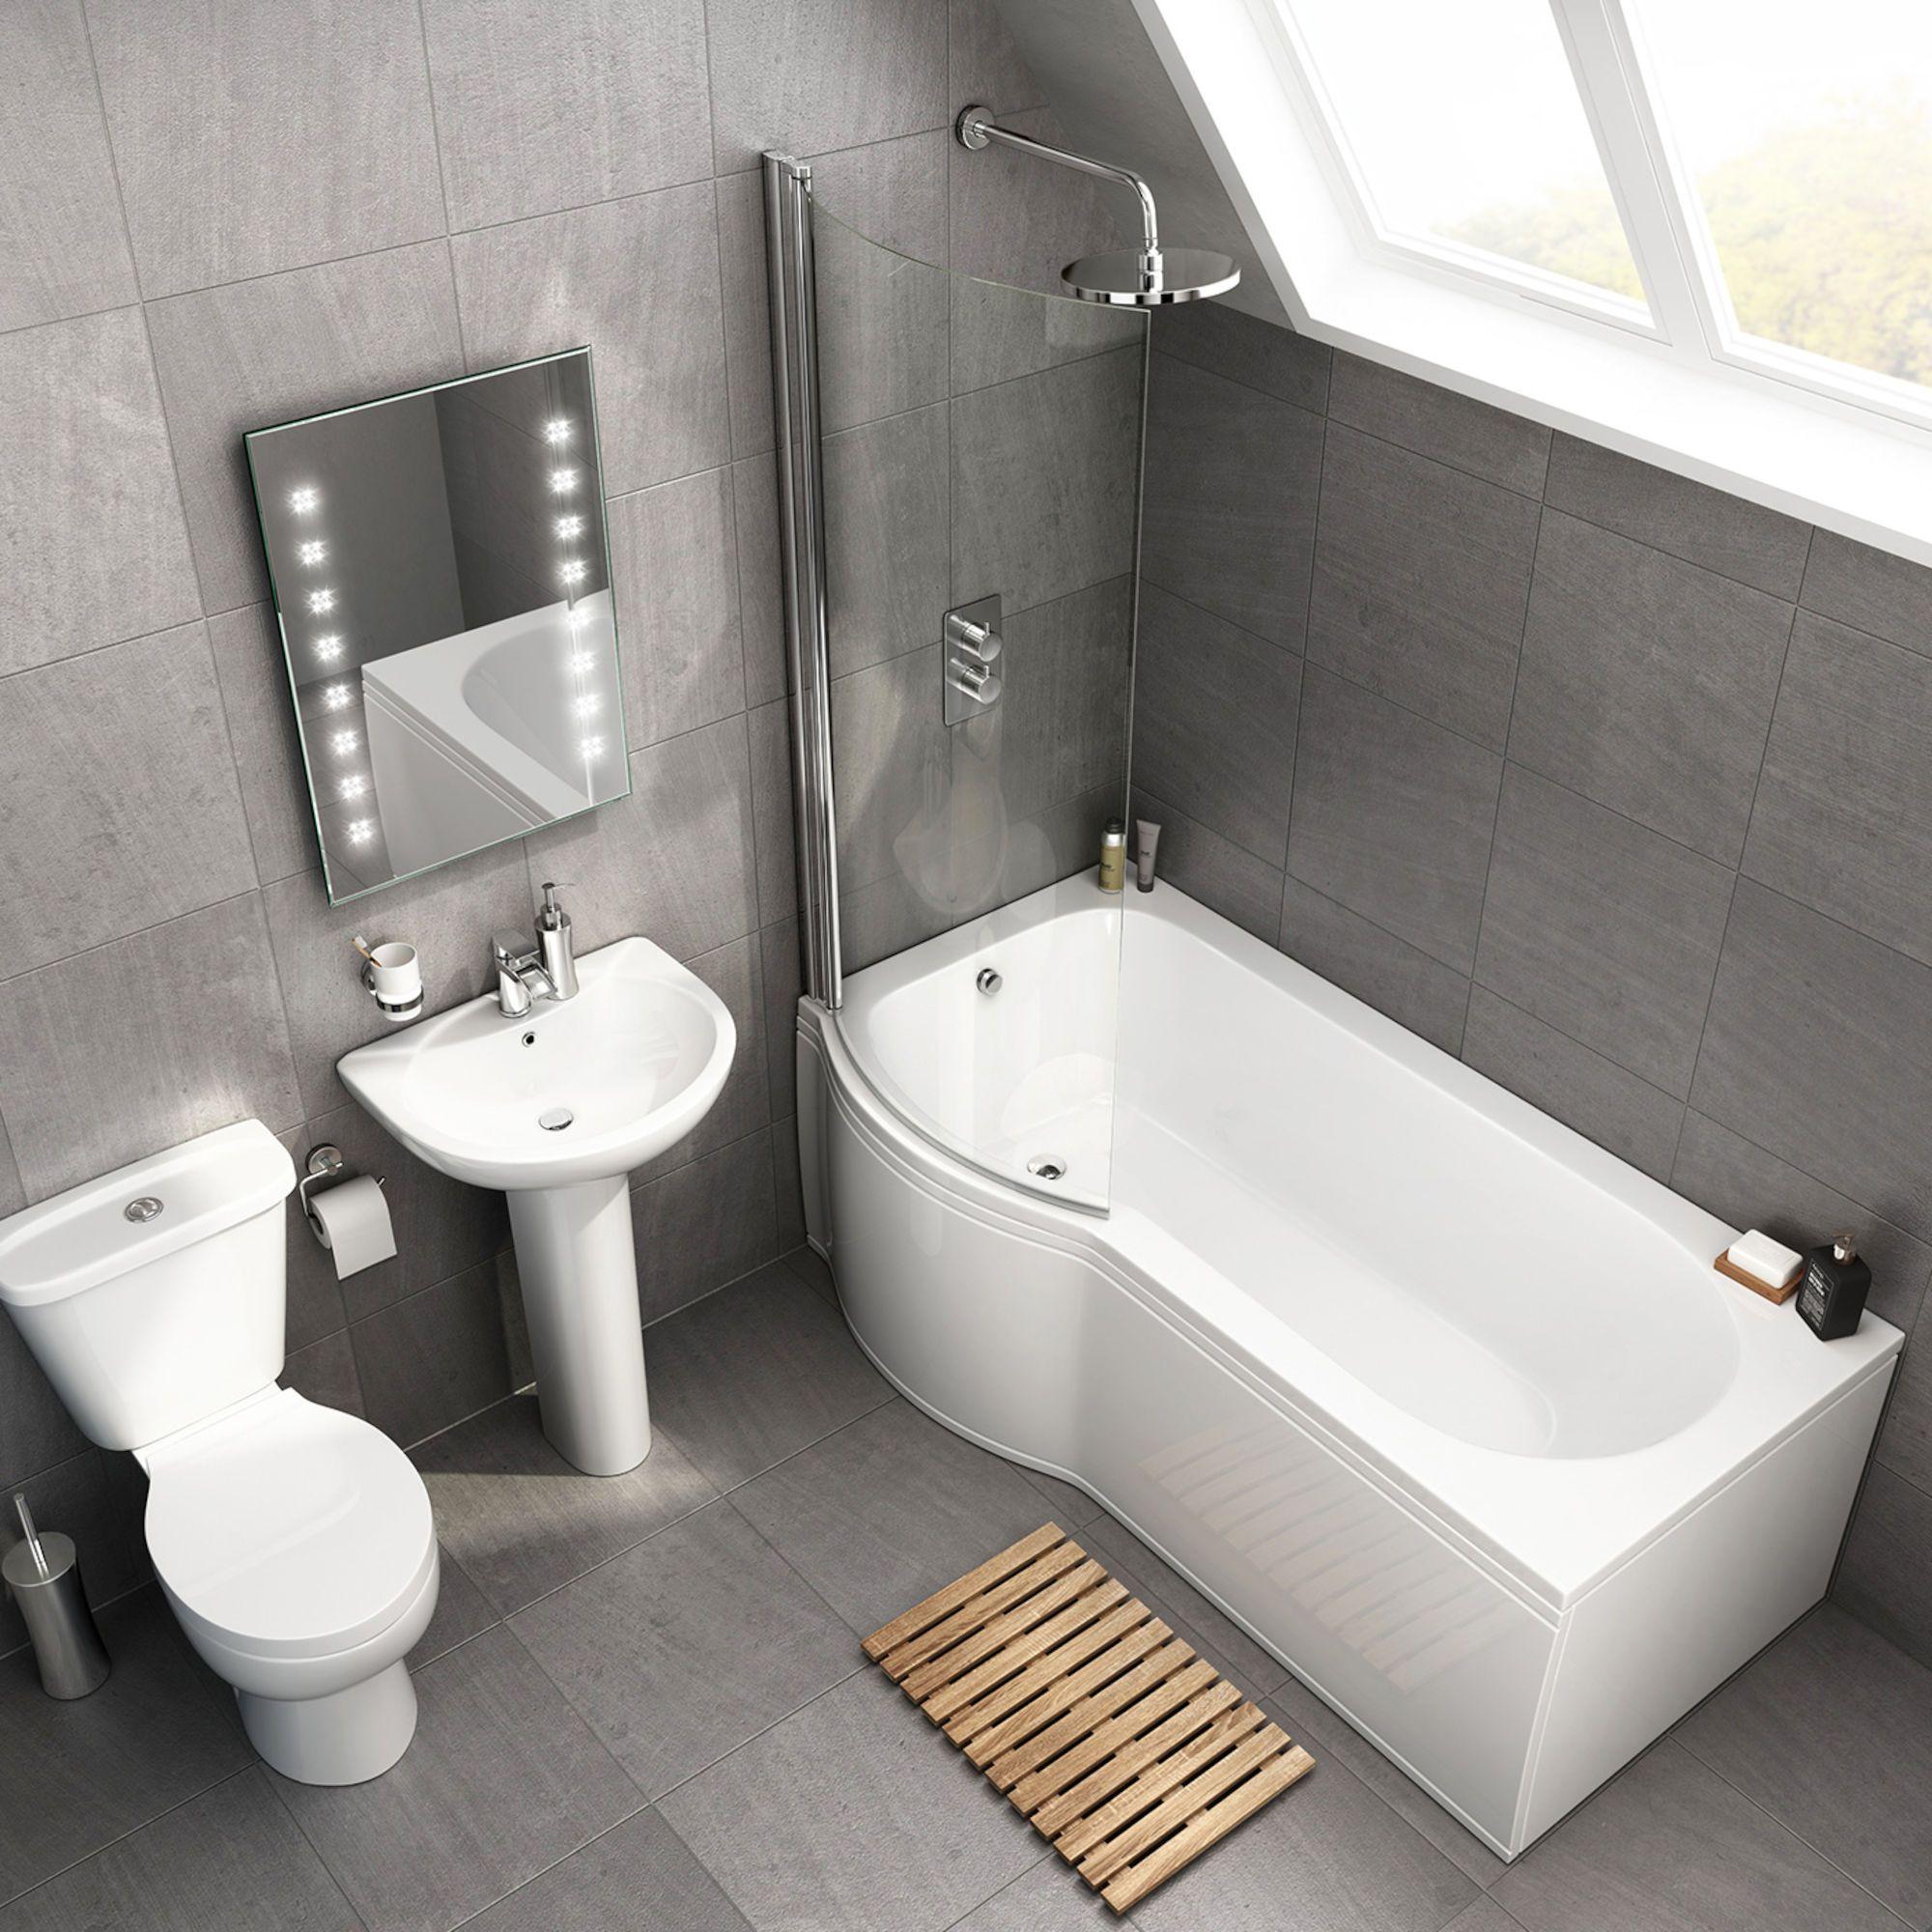 1700x850mm Quartz P Shaped Left Handed Shower Bath Suite Soak Com Small Bathroom Remodel Designs Bathroom Remodel Designs Small Bathroom